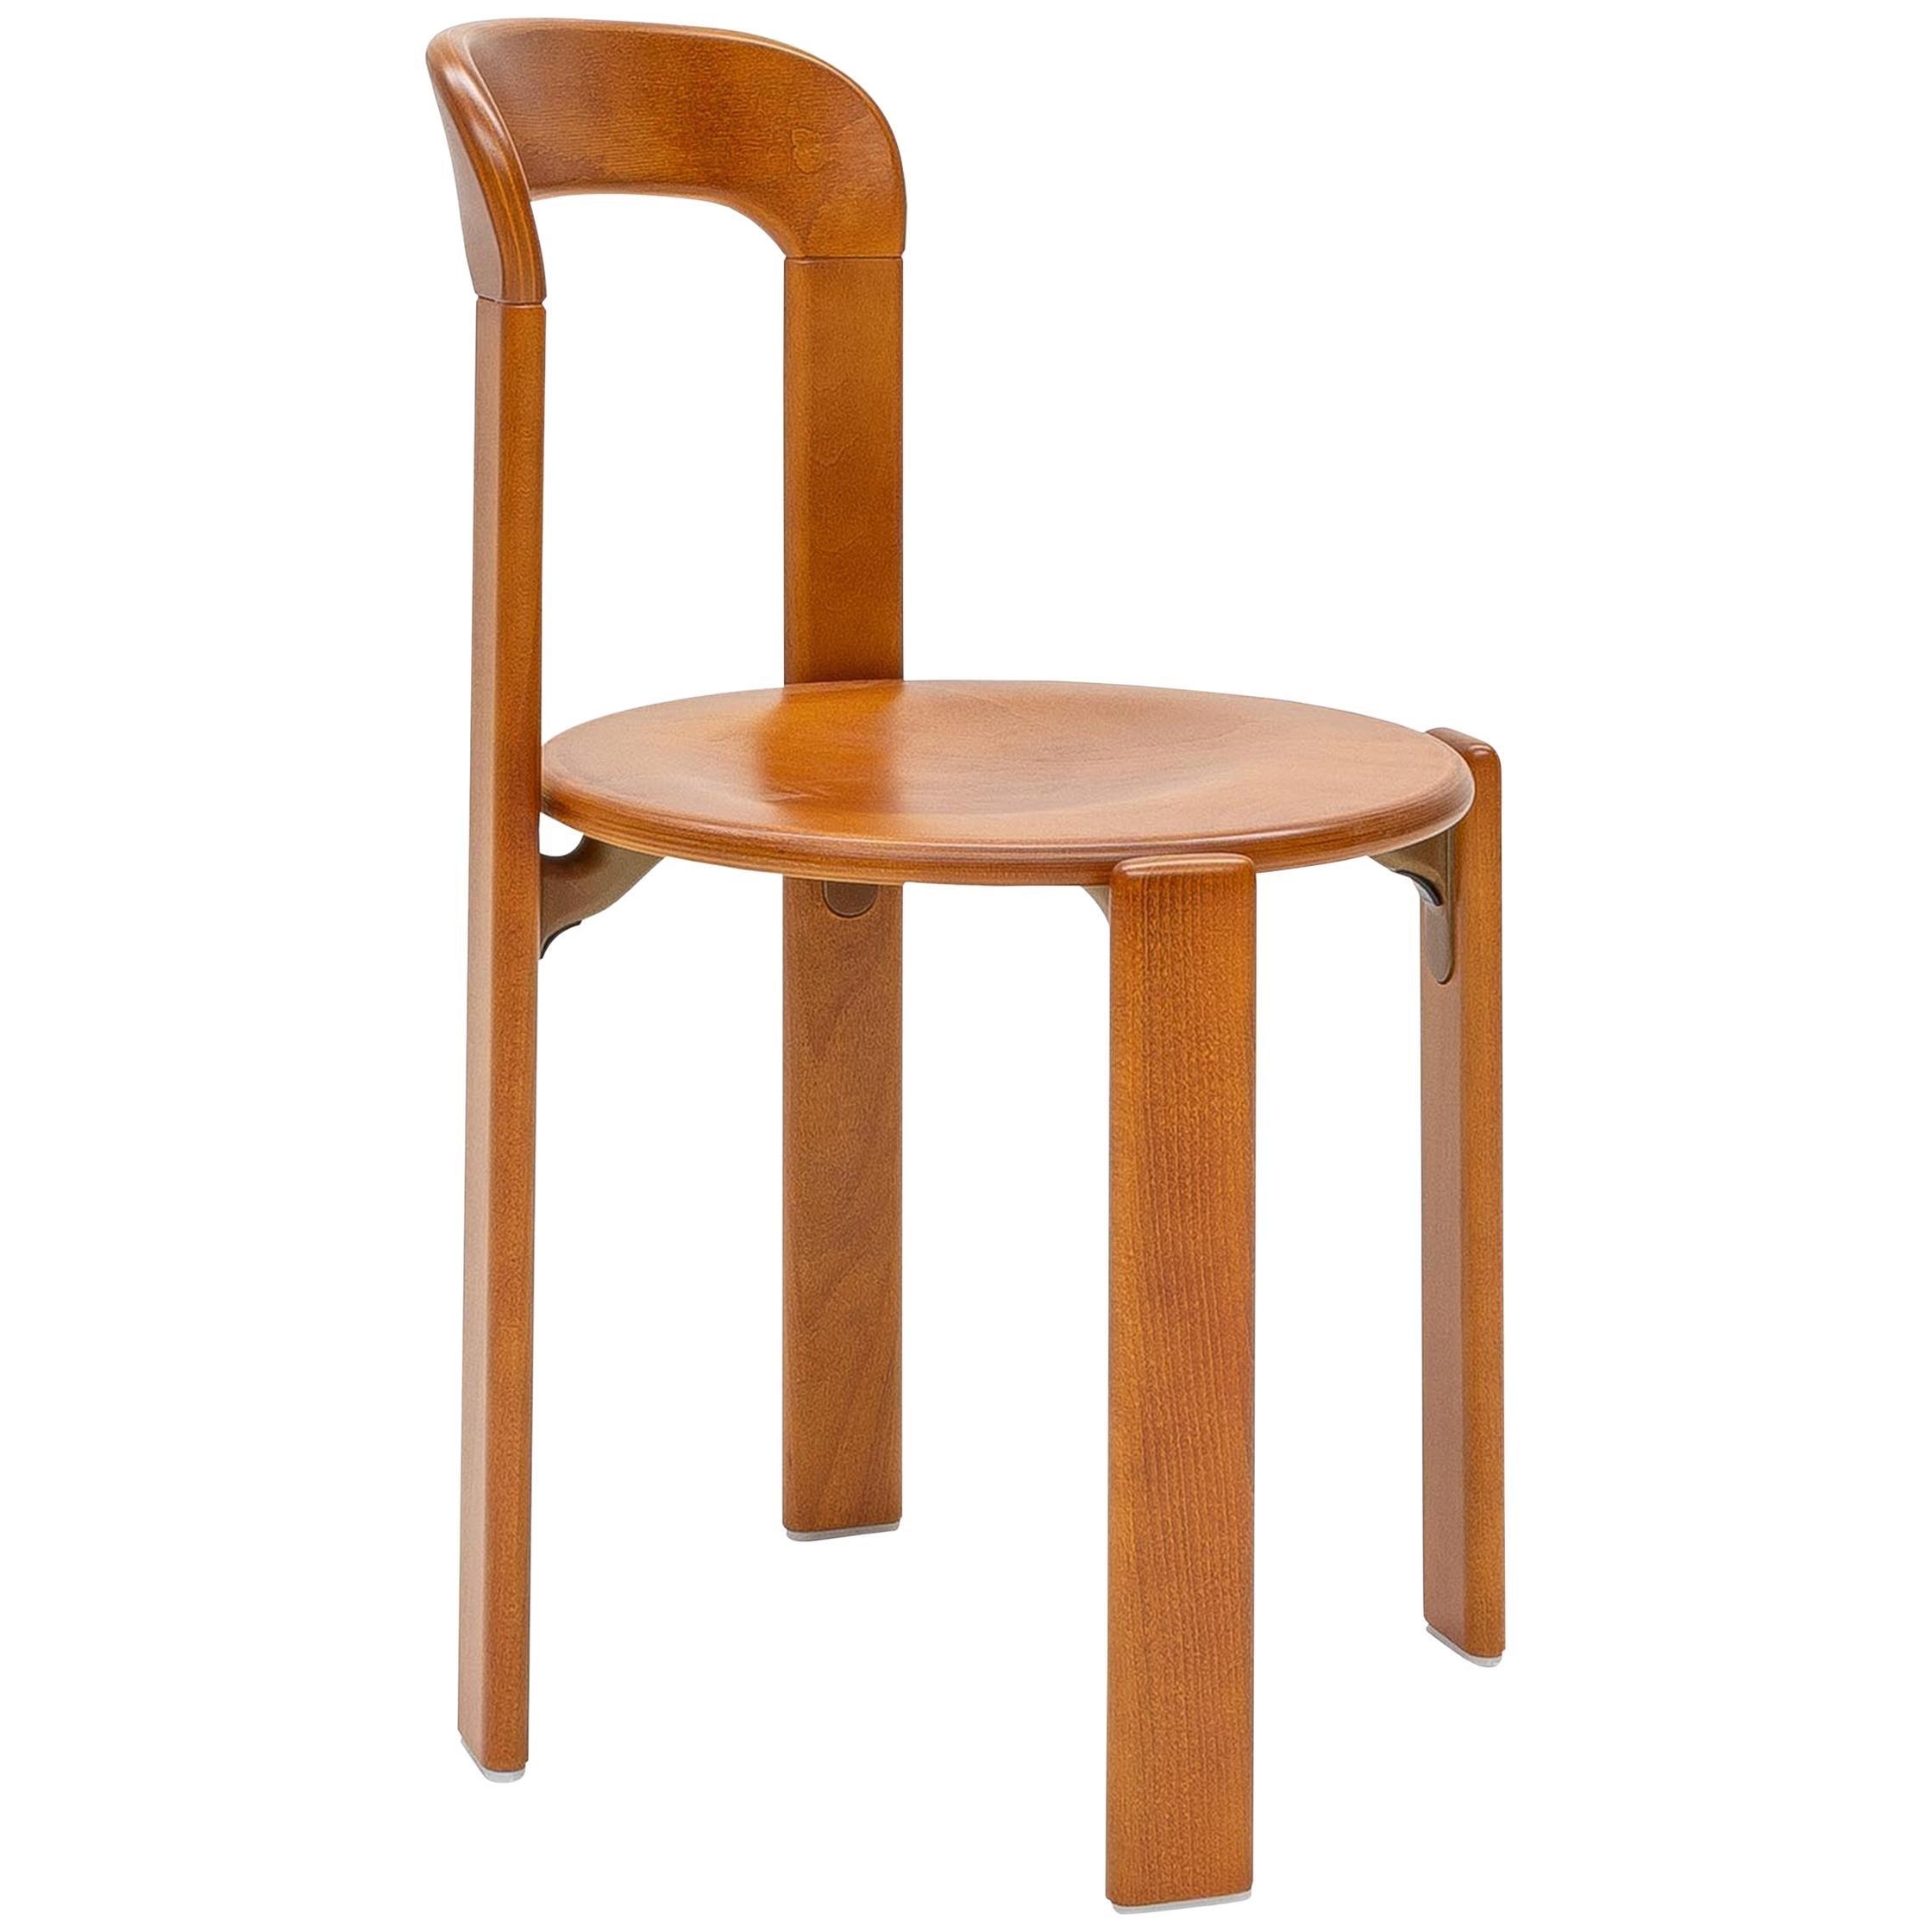 Mid-Century Modern, Rey Chair by Bruno Rey, Color Vintage Cherry, Design 1971